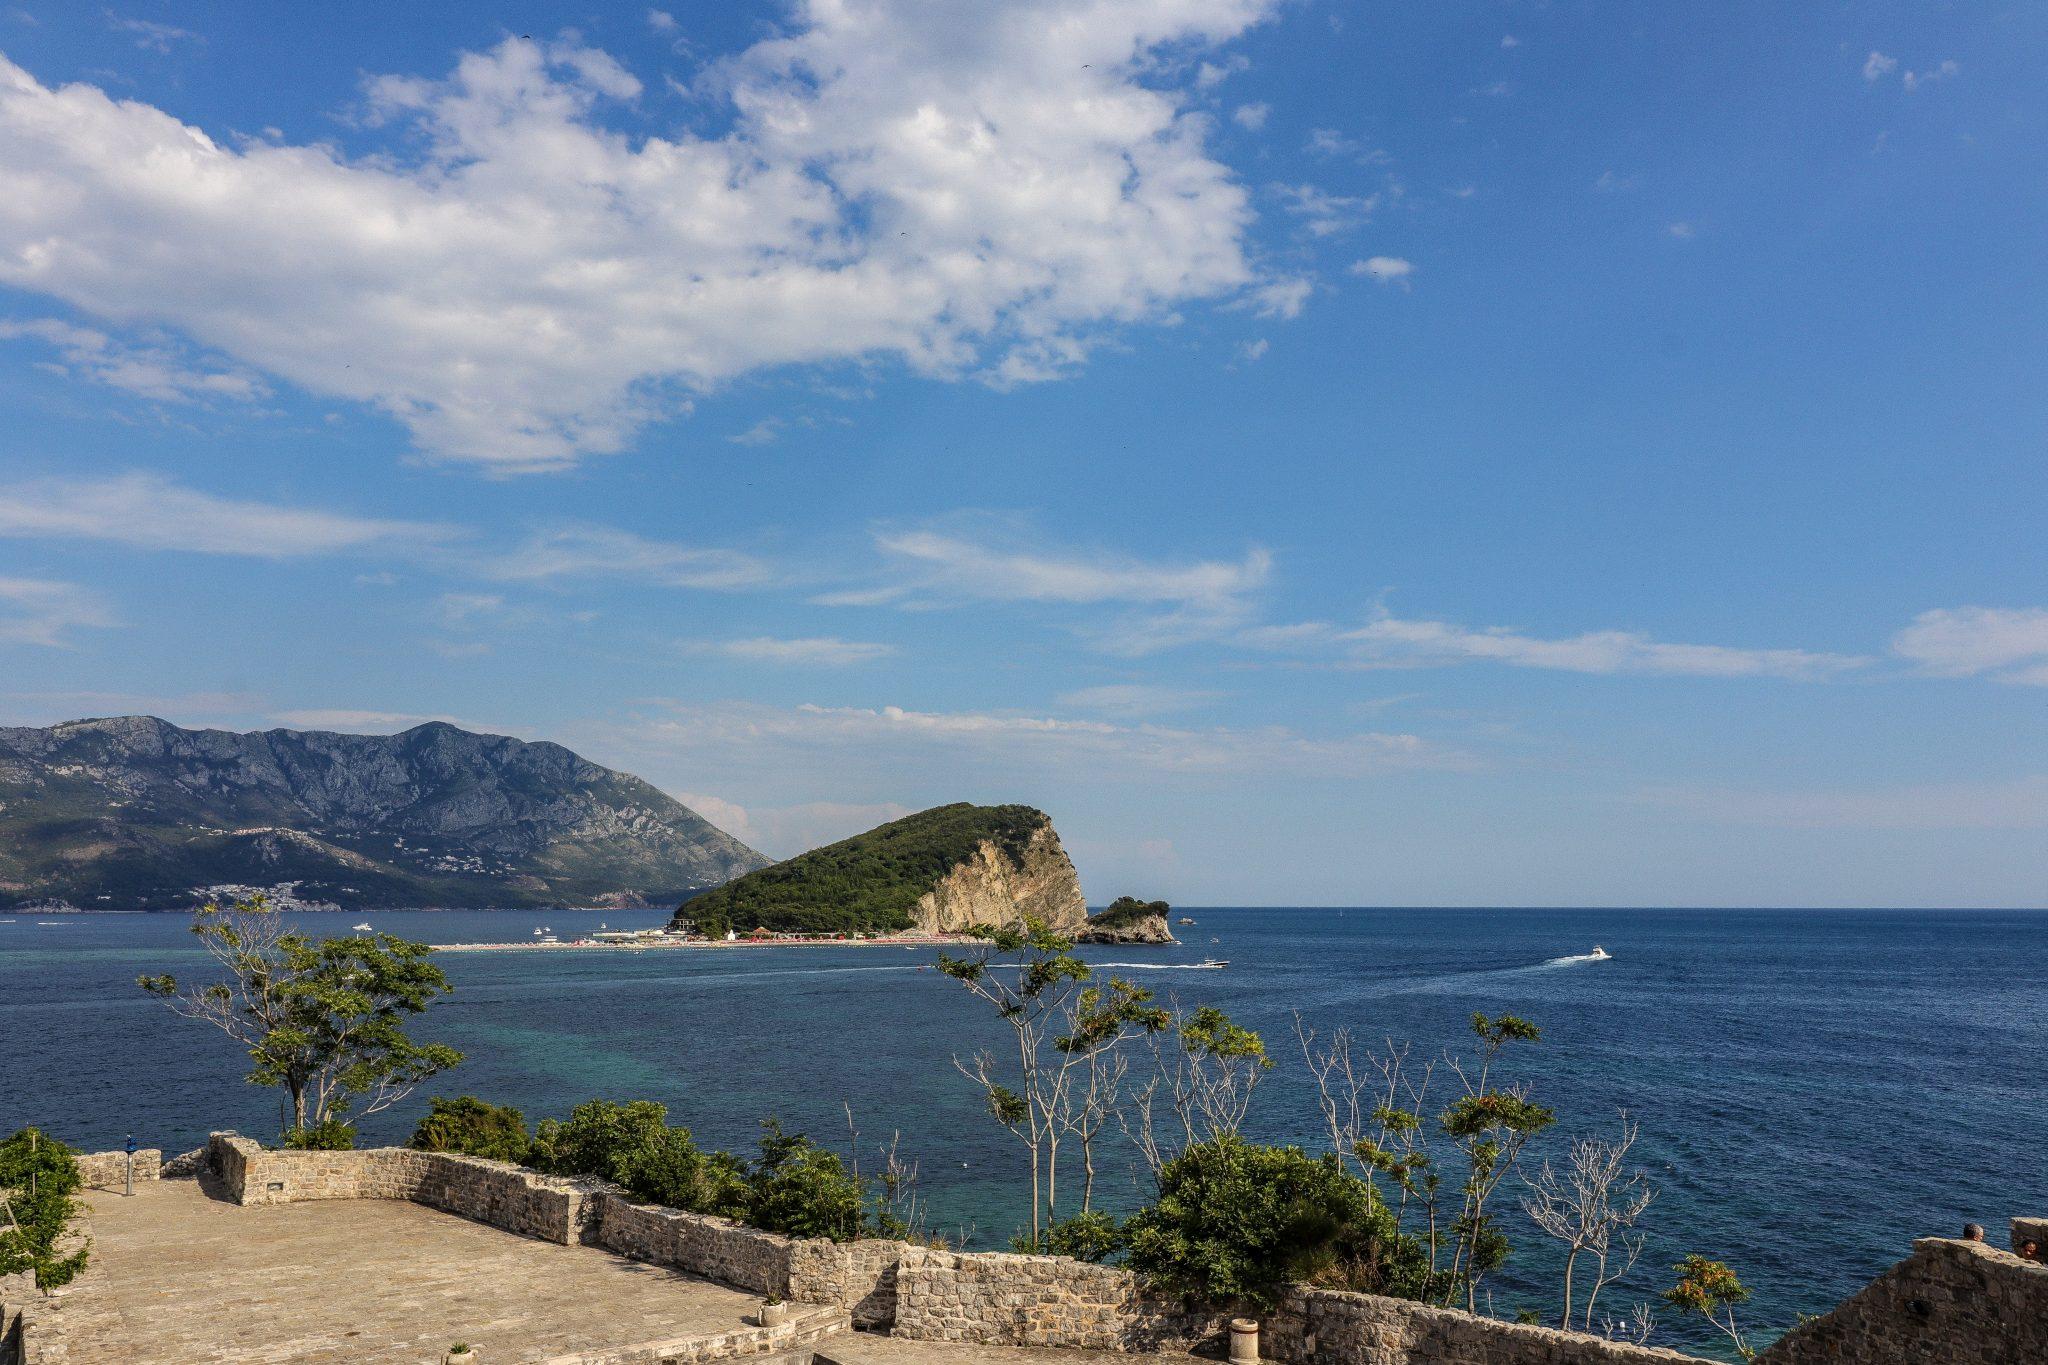 St Nikola Island, Budva, Montenegro